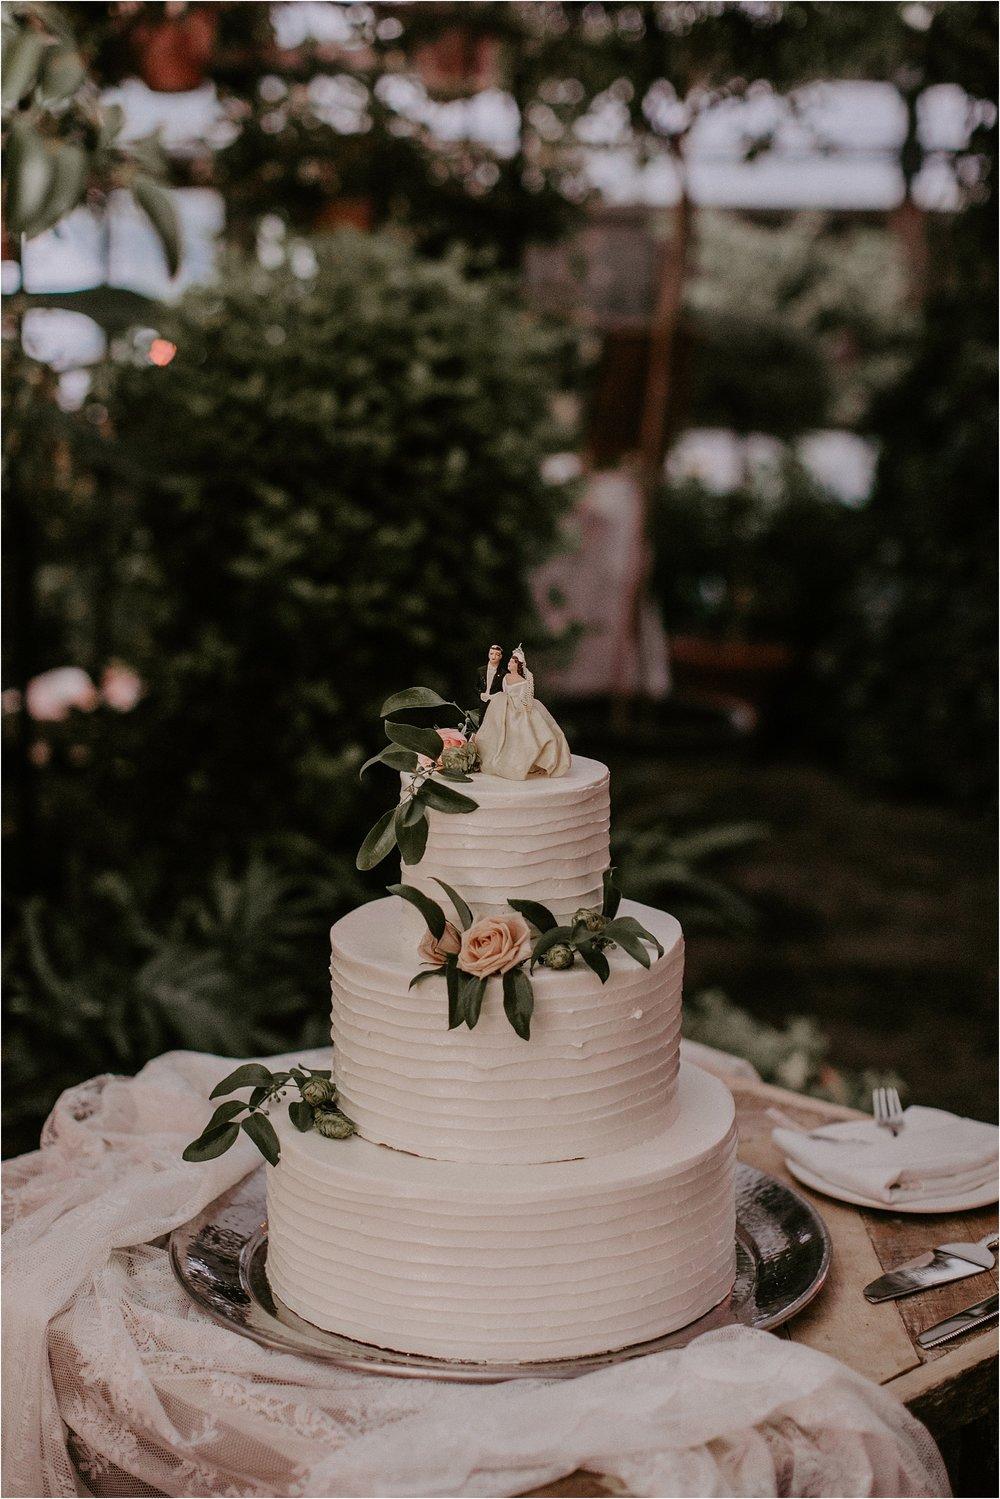 Sarah_Brookhart_Hortulus_Farm_Garden_and_Nursey_Wedding_Photographer_0077.jpg